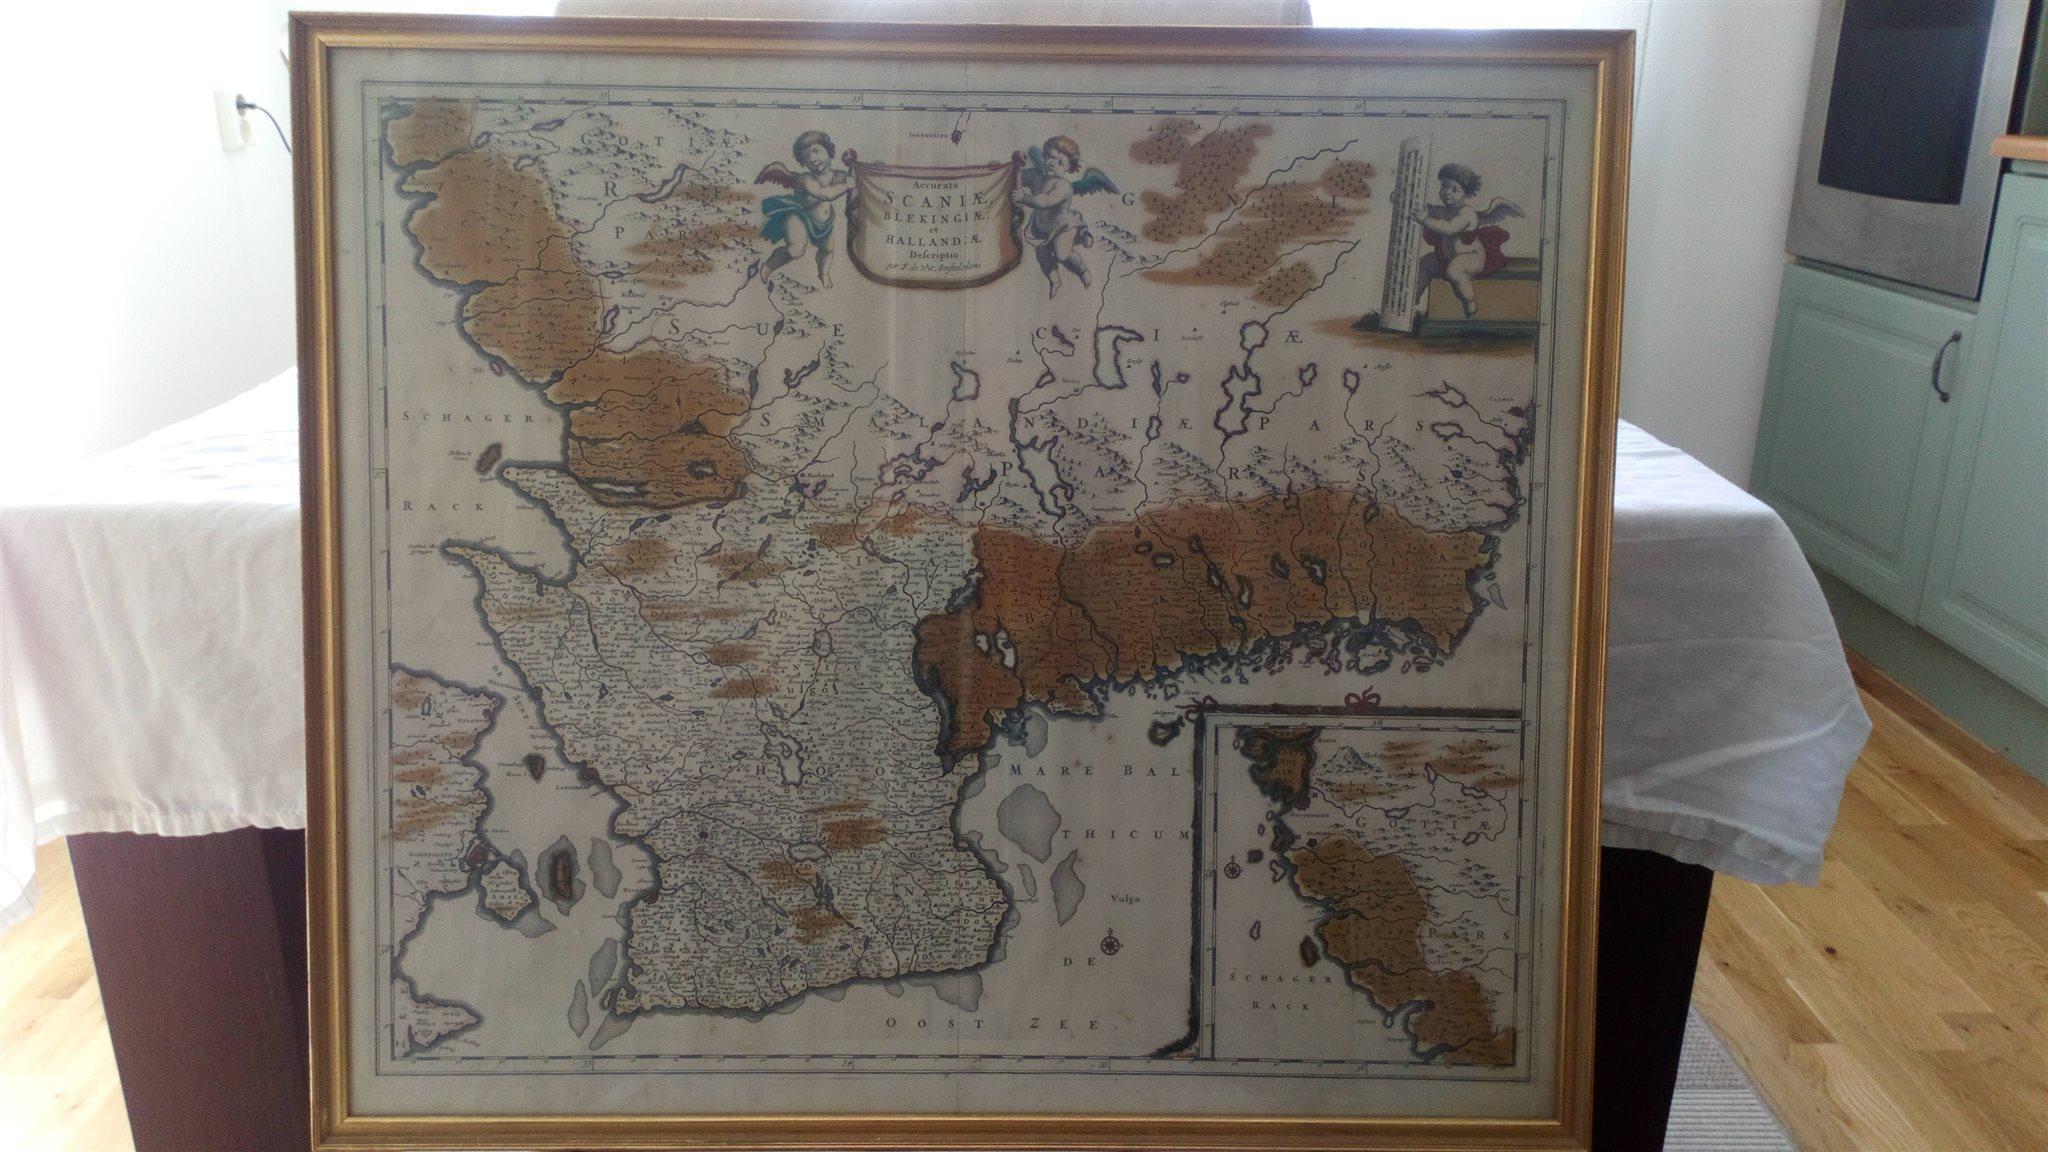 Karta Blekinge Skane.Antik Karta Over Blekinge Skane Och Halland 339281634 ᐈ Kop Pa